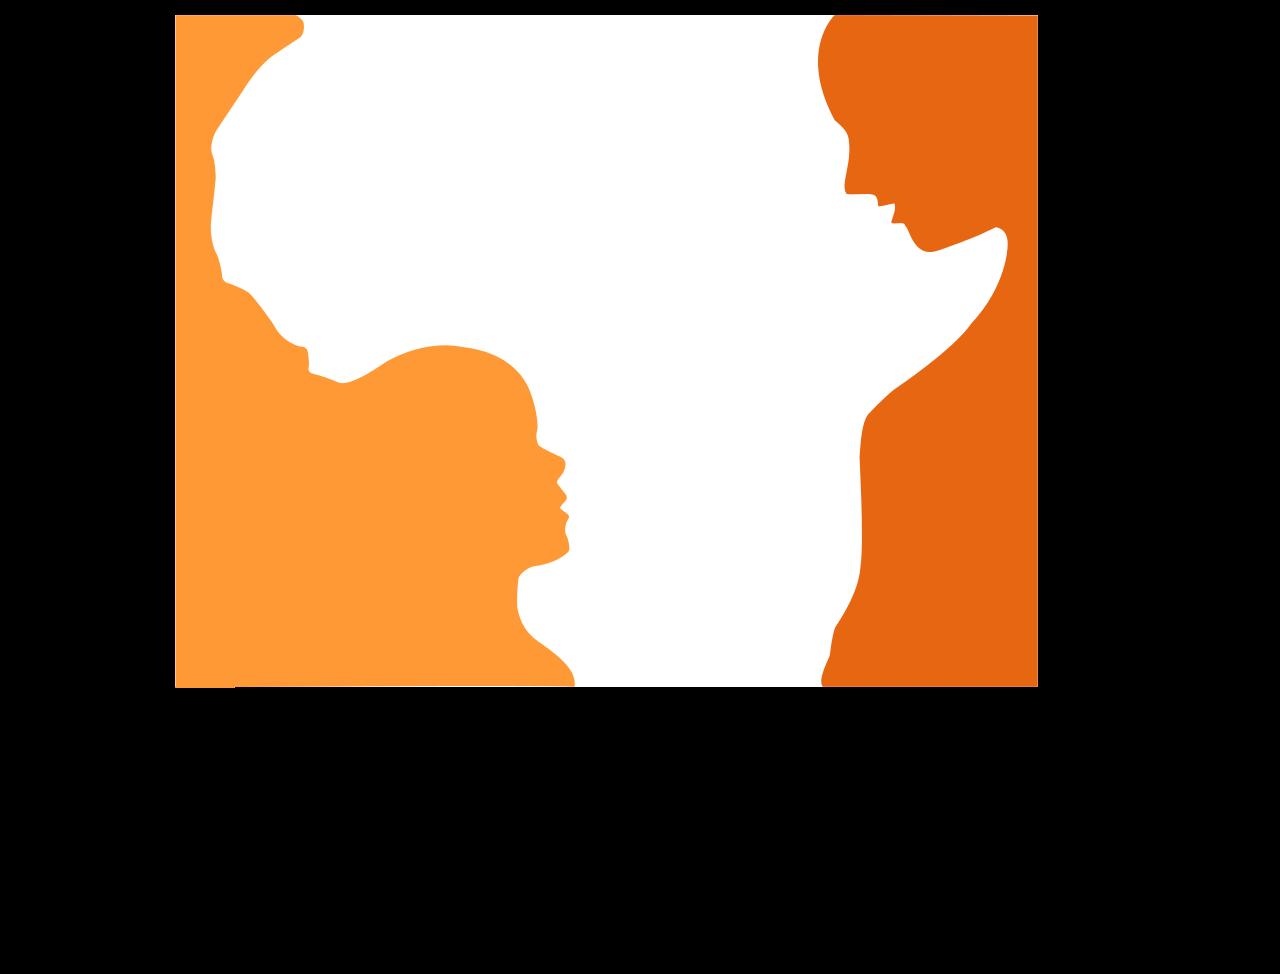 Africa subliminale nel logo